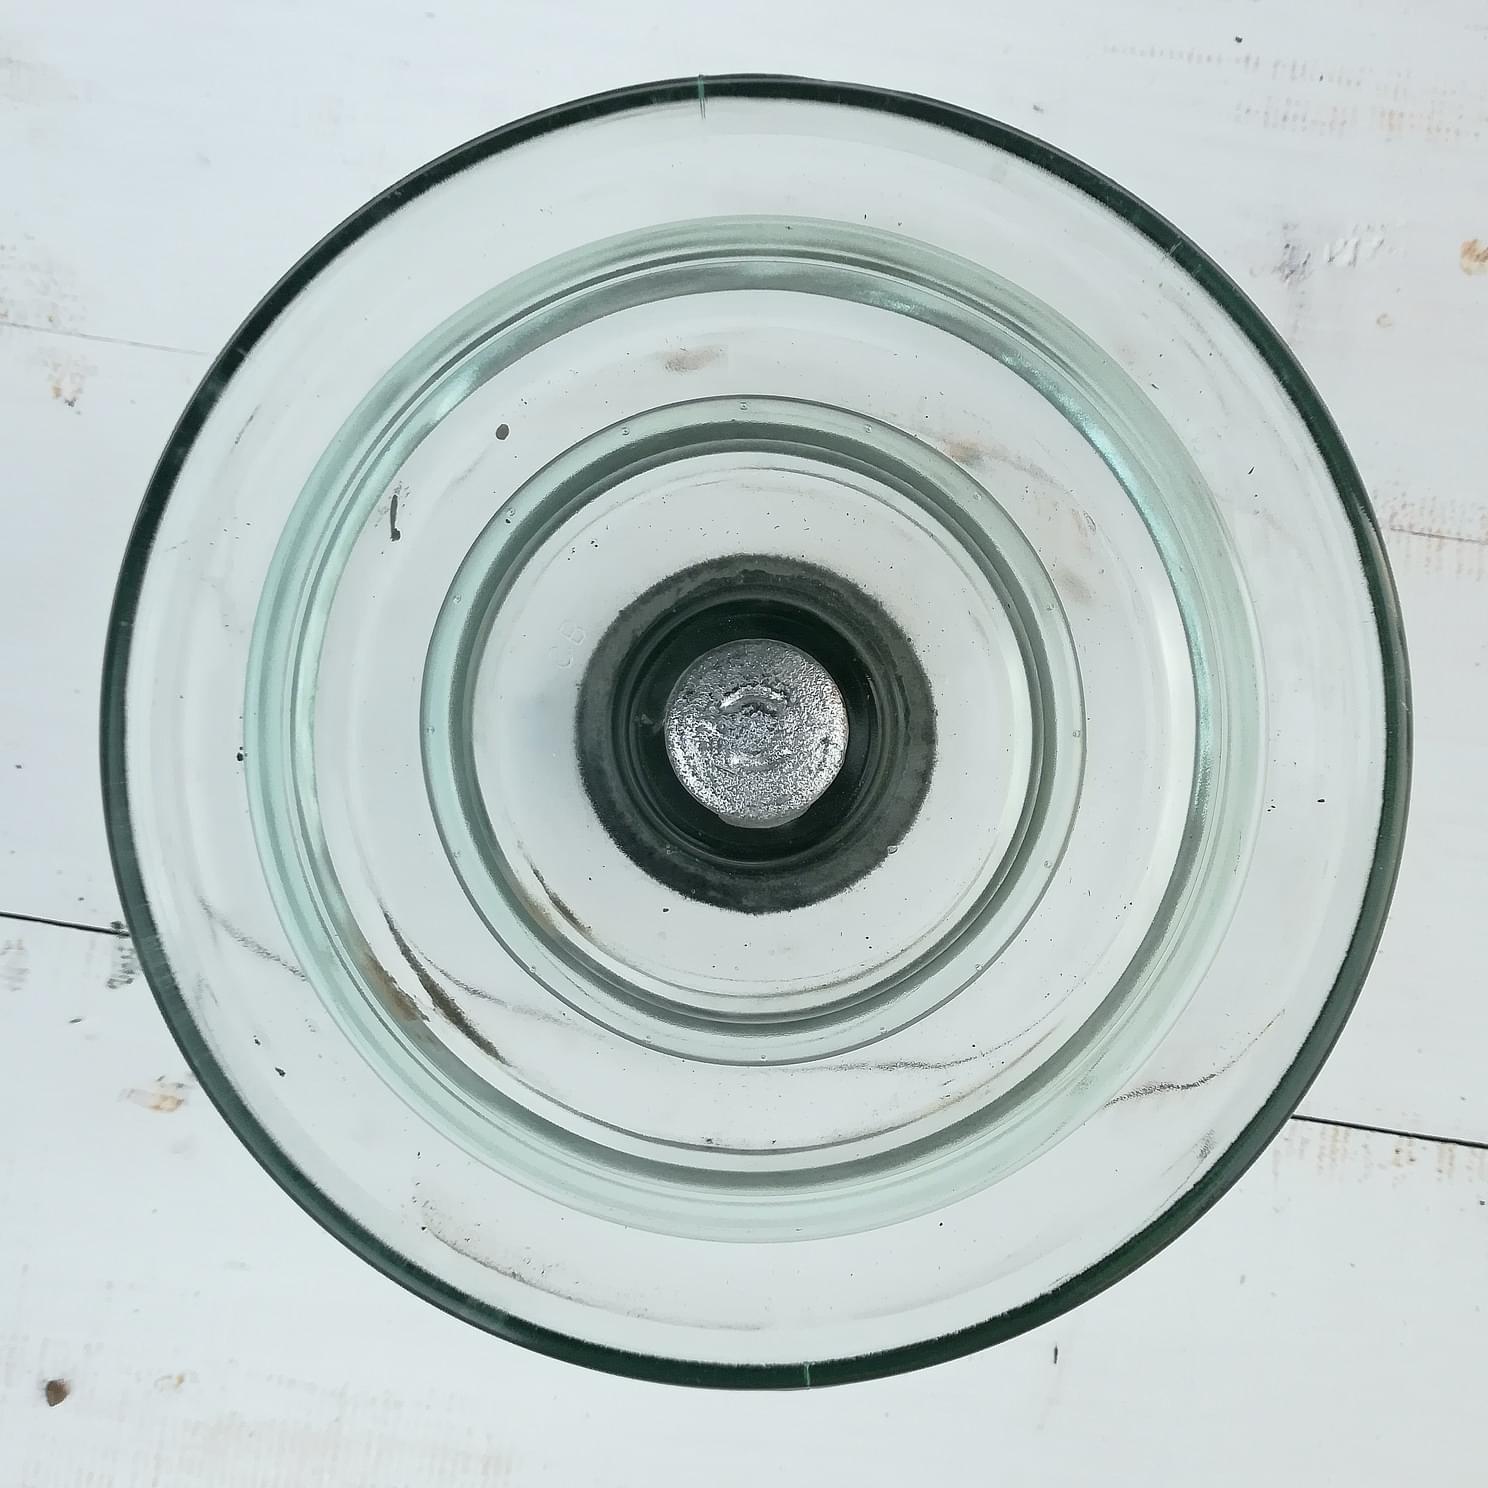 Glass electrical insulator